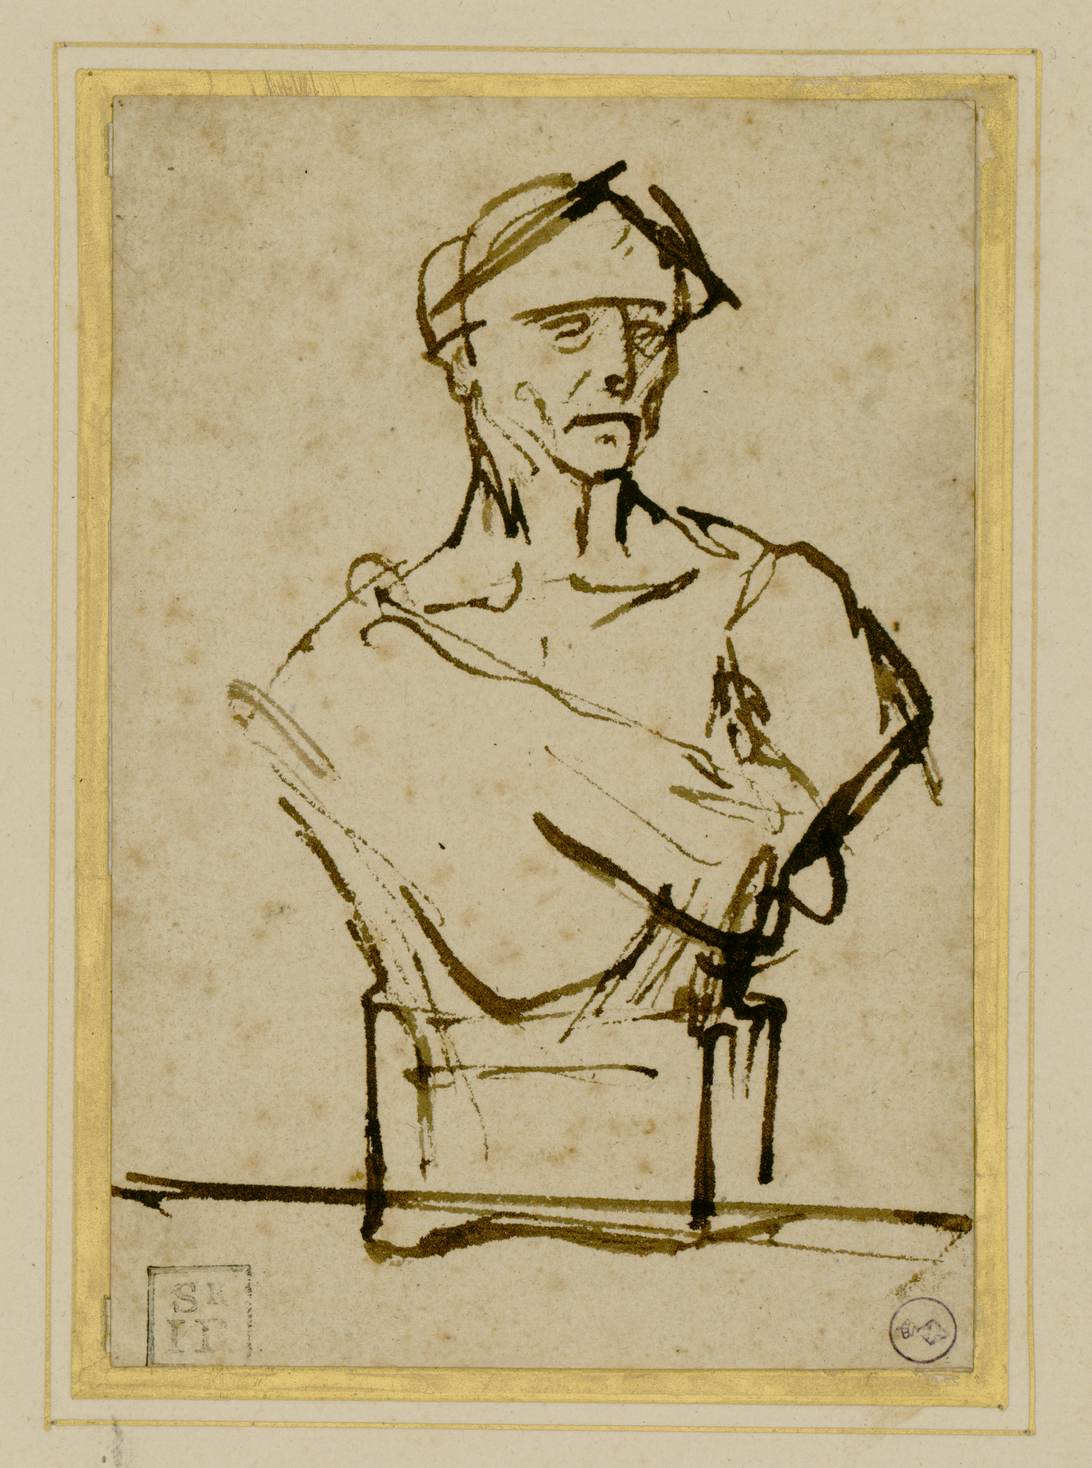 Rembrandt van Rijn, Busto di imperatore, Biblioteca Reale Turijn